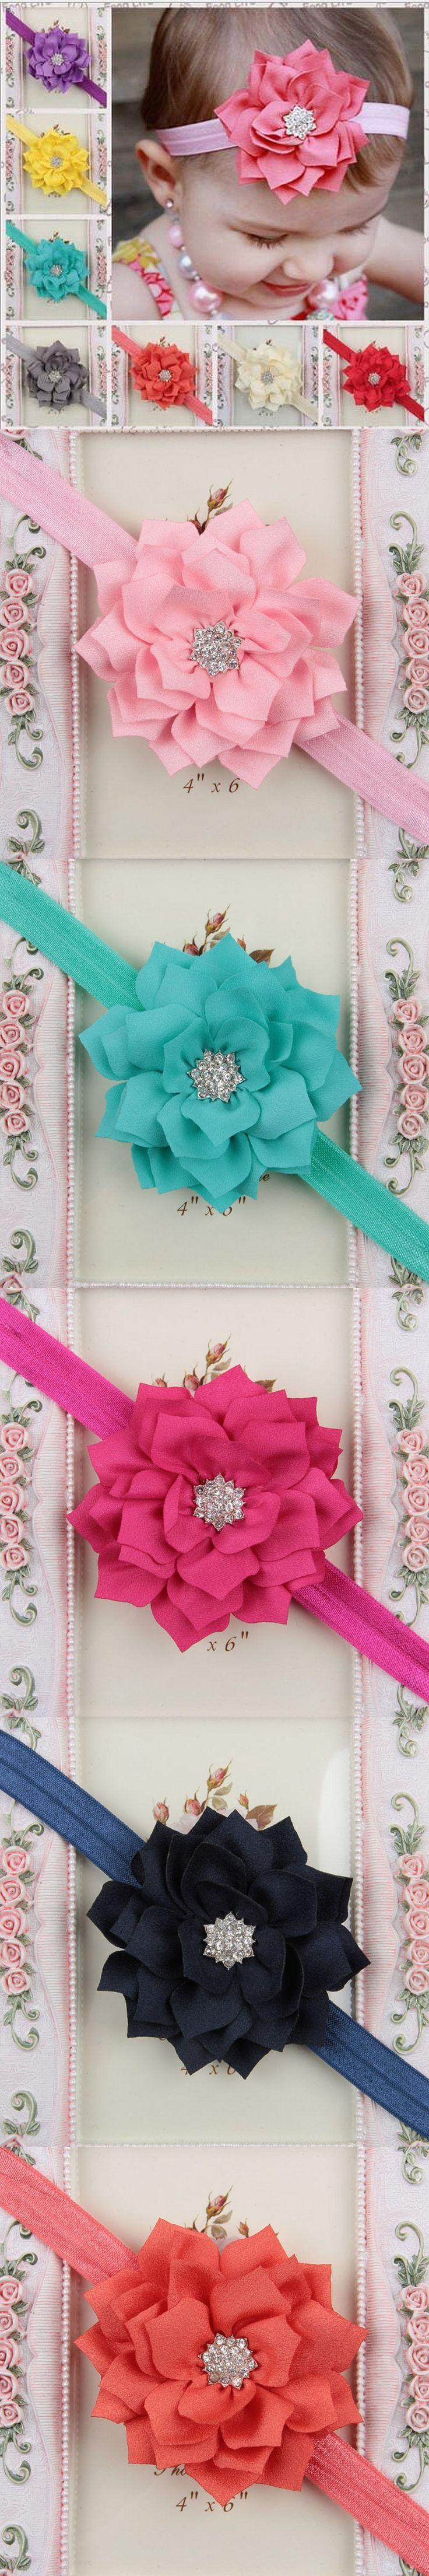 Teen Headband Silk Flower Baby Headband W/ Star Rhinestone Newborn Headband Toddler Headbands decoration for hair $9.98